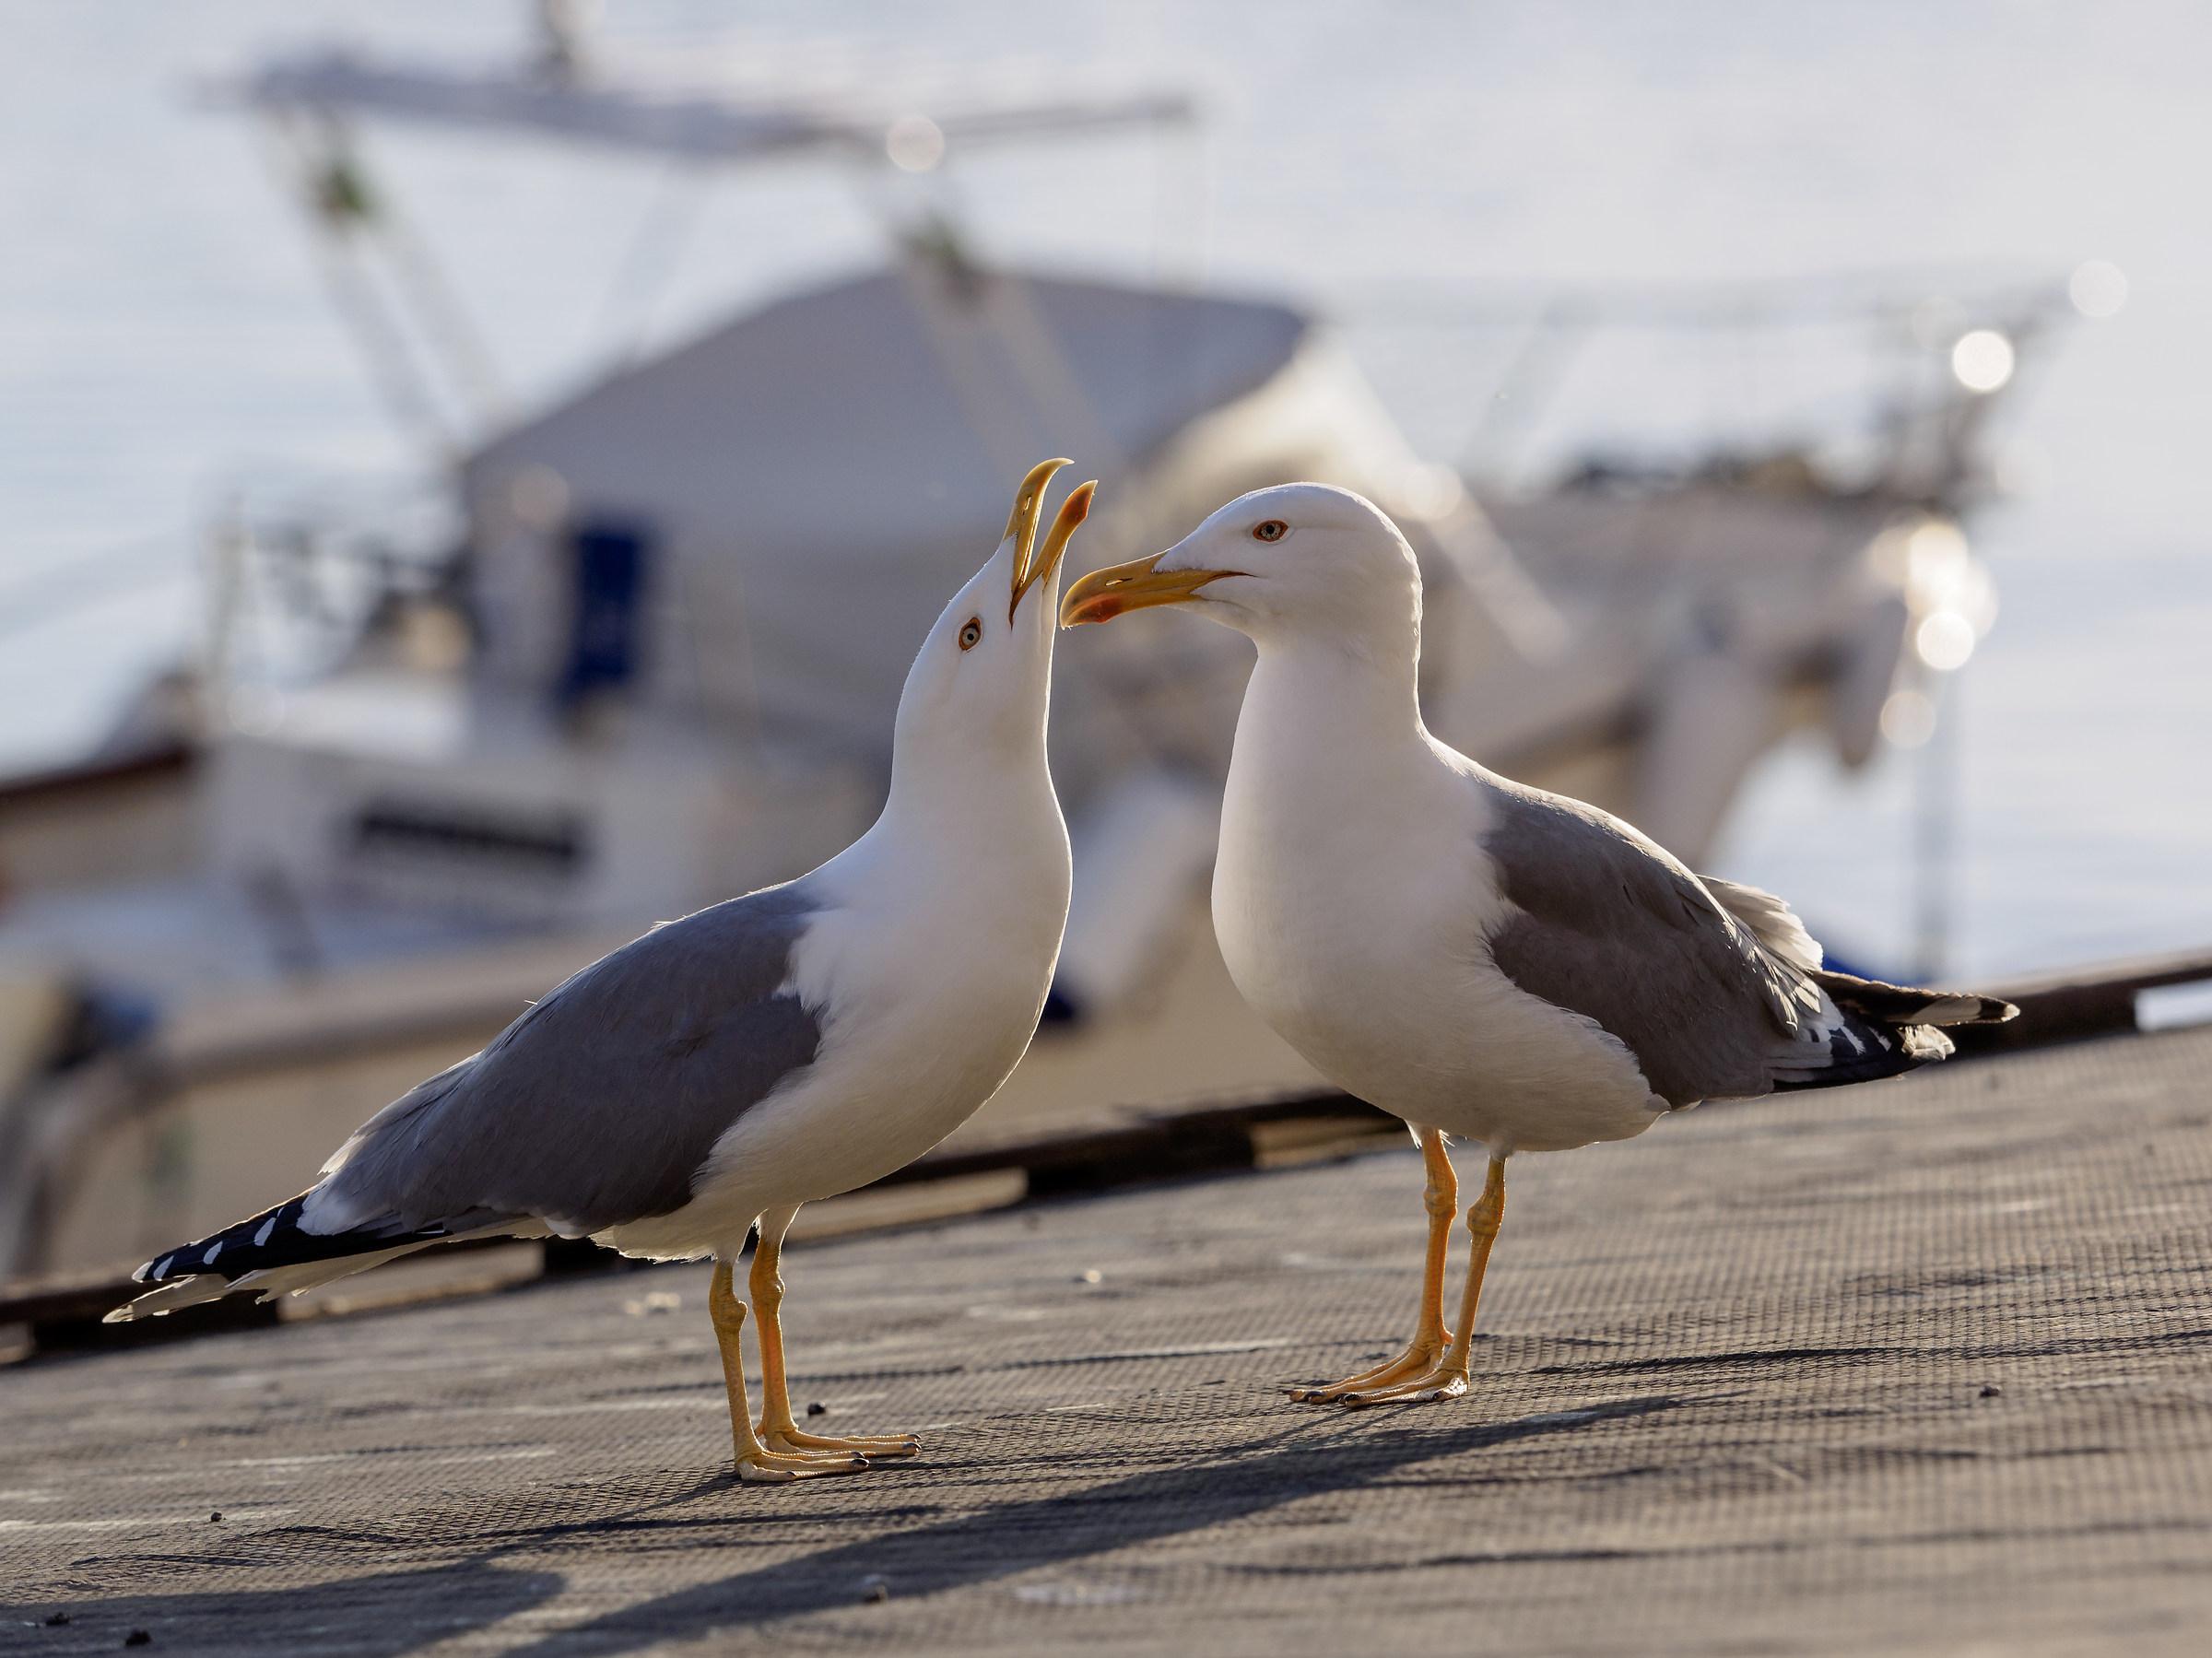 Seagulls in love 2...